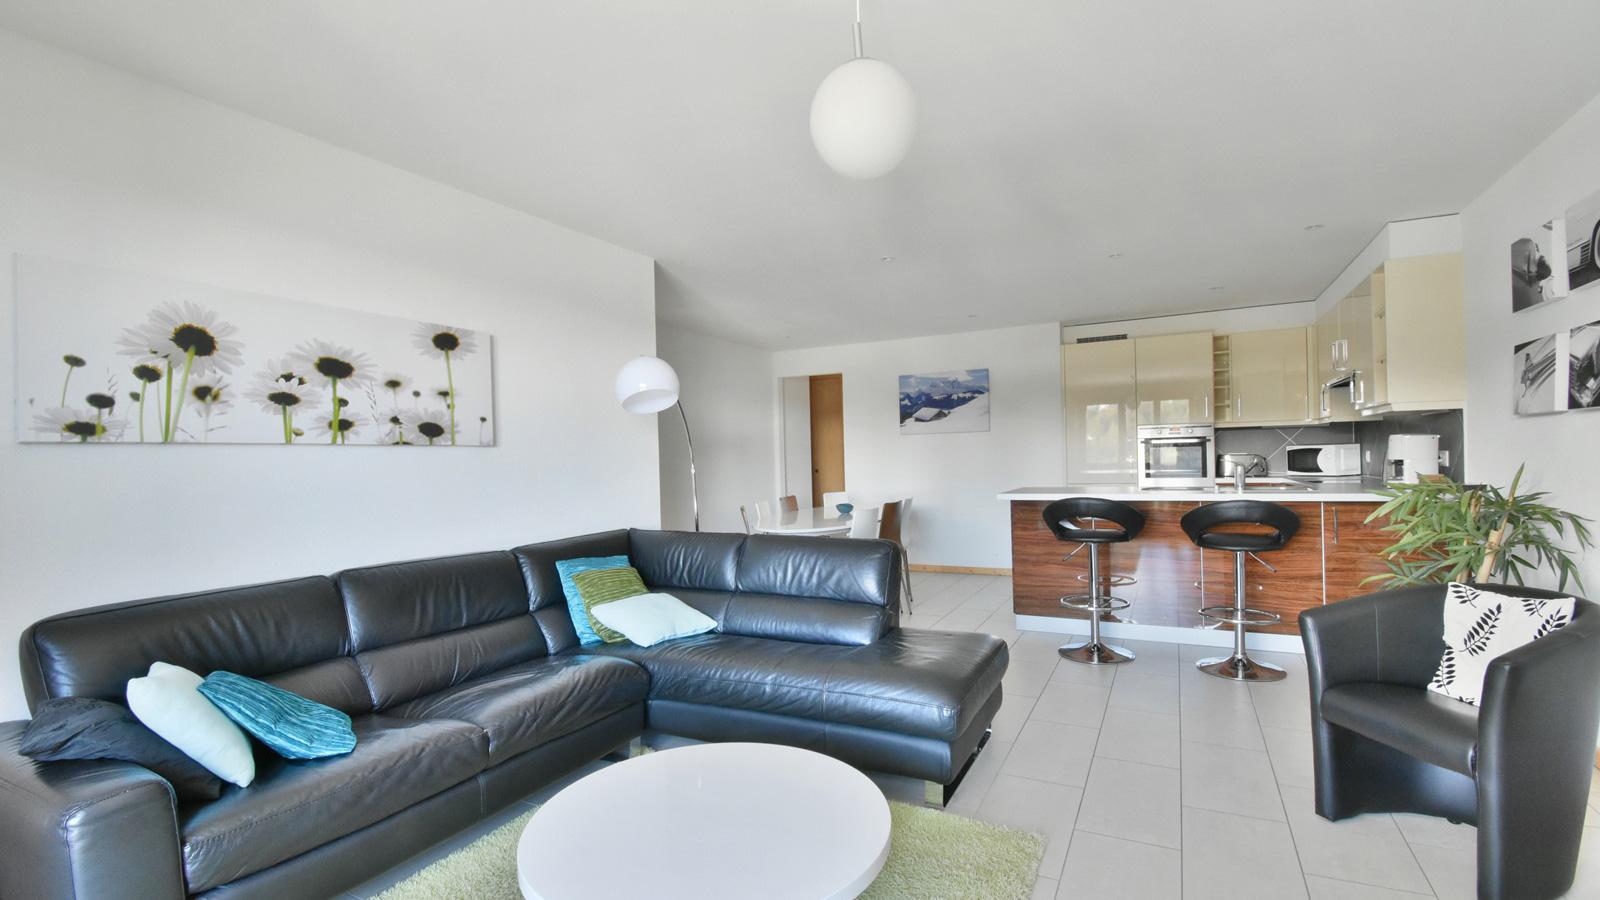 Vaudoise Apartment Apartments, Switzerland